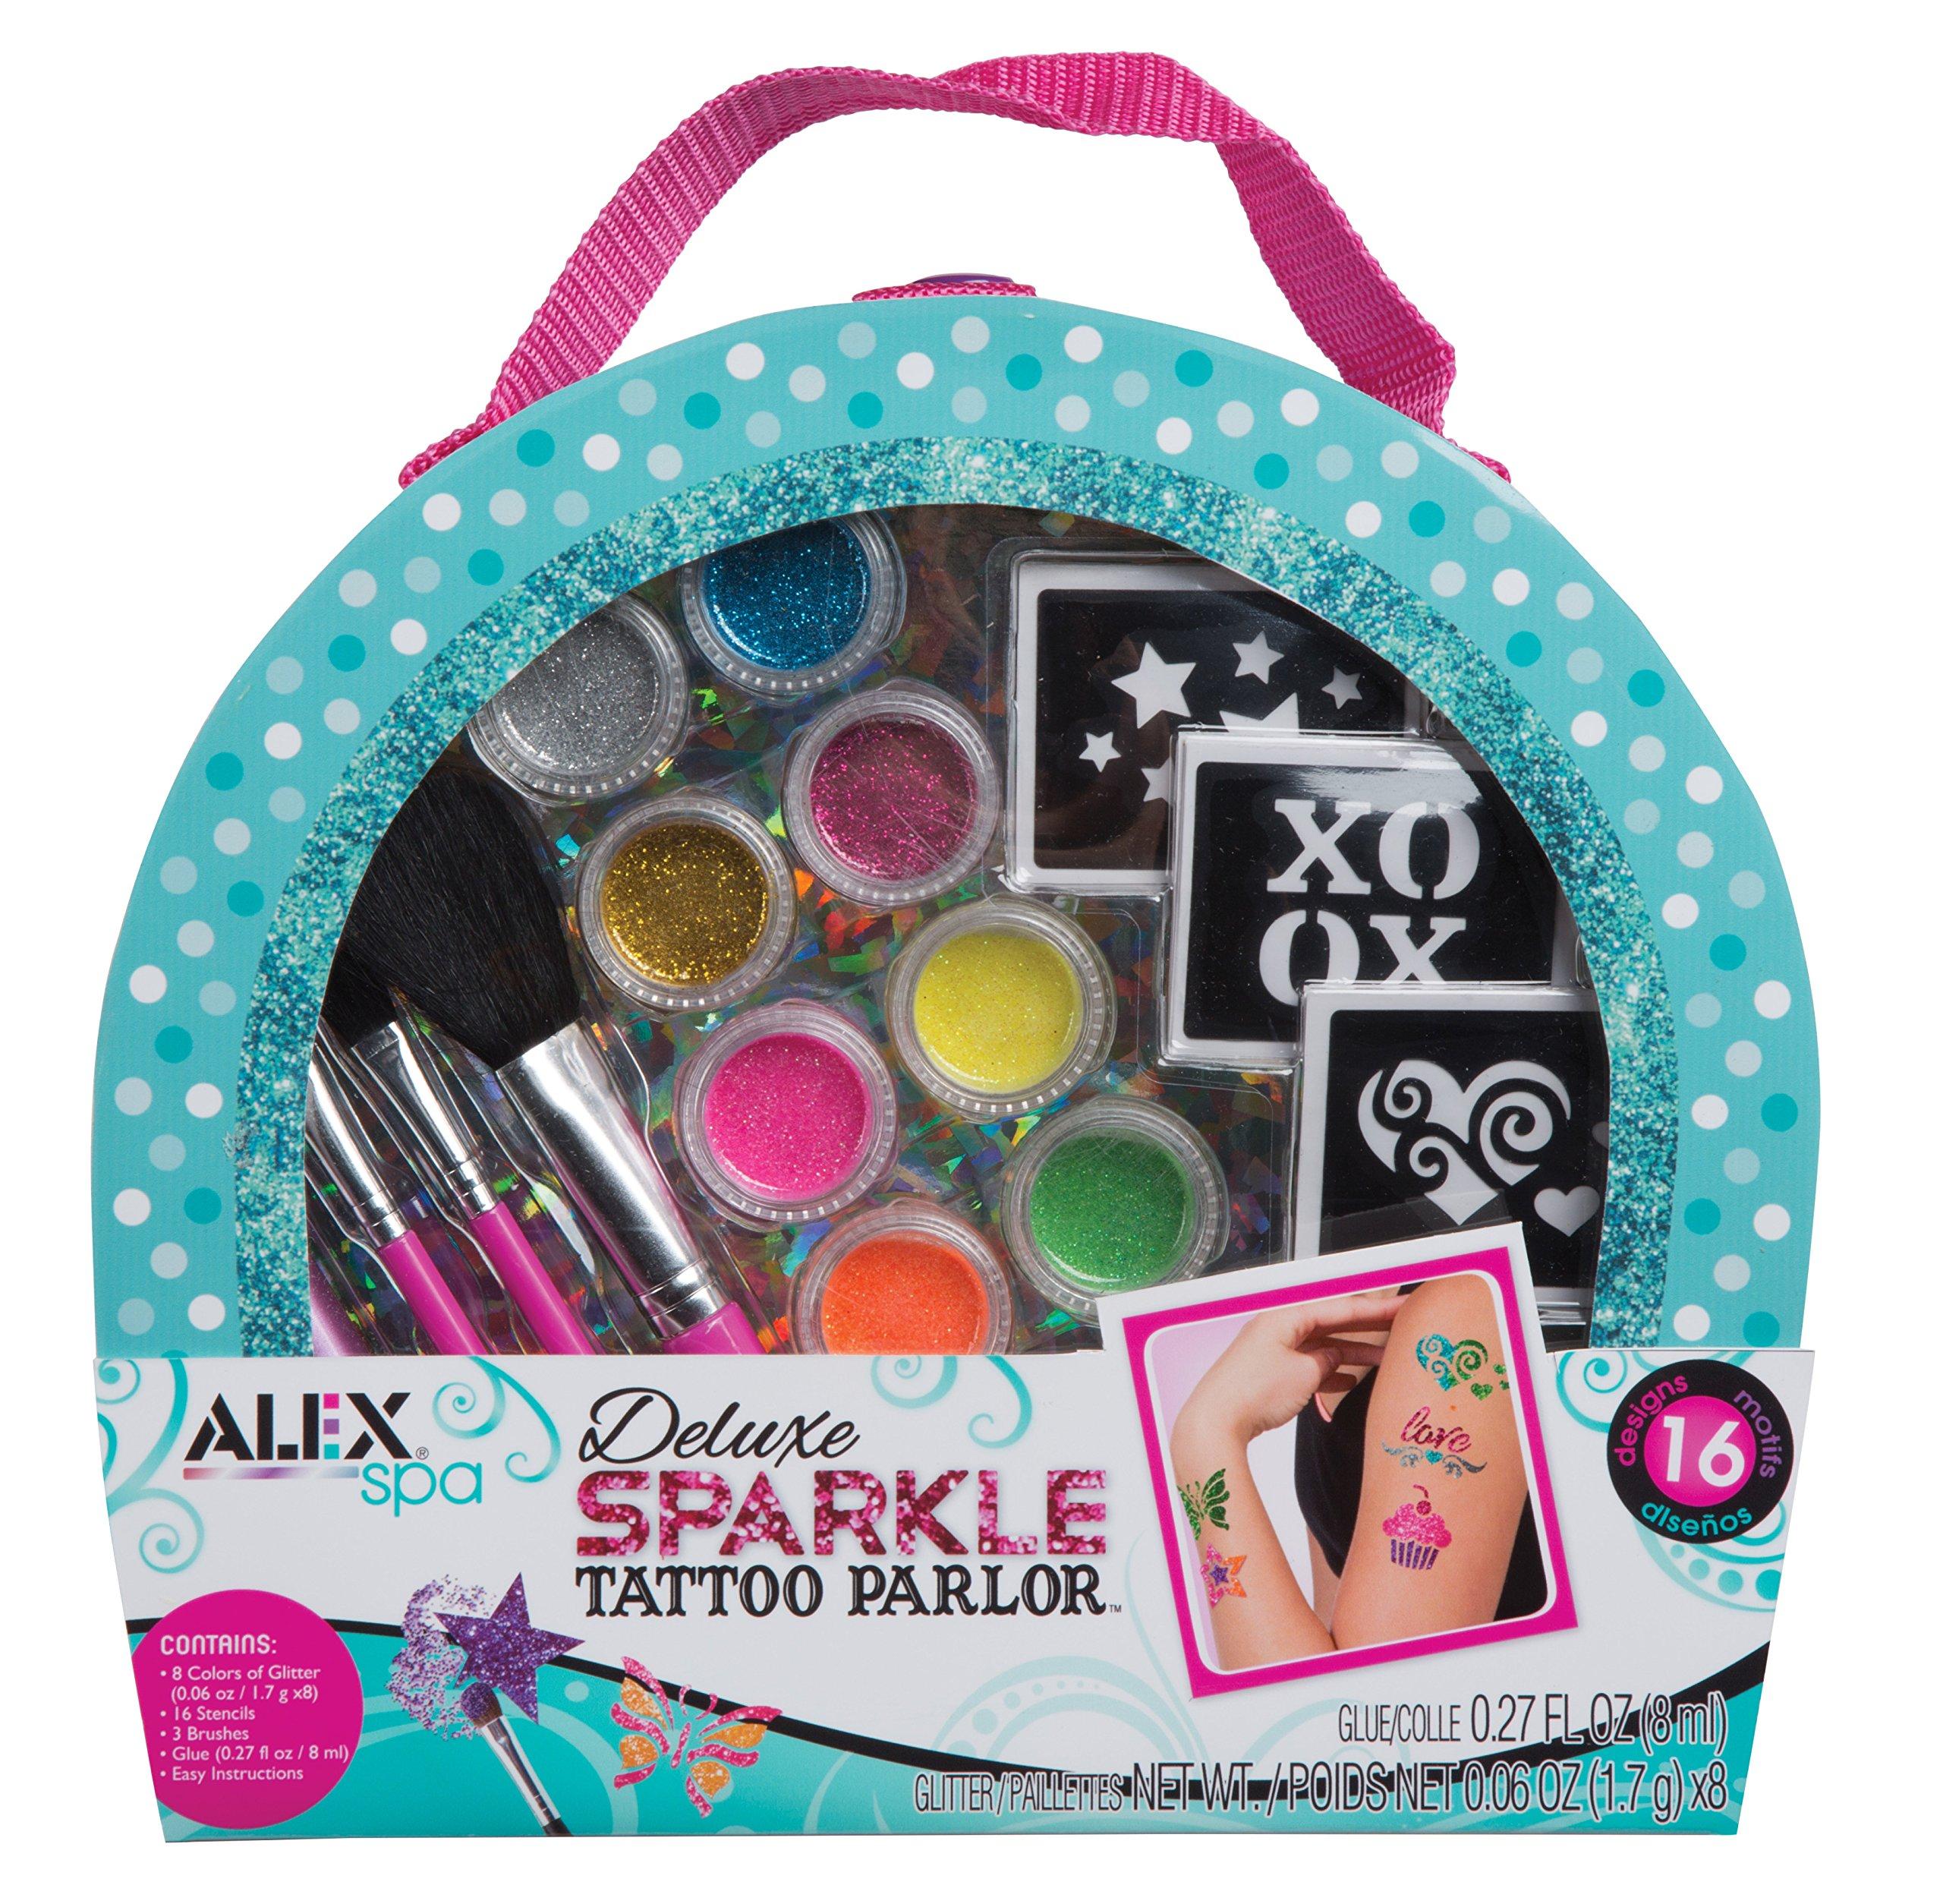 ALEX Spa Deluxe Sparkle Tattoo Parlor